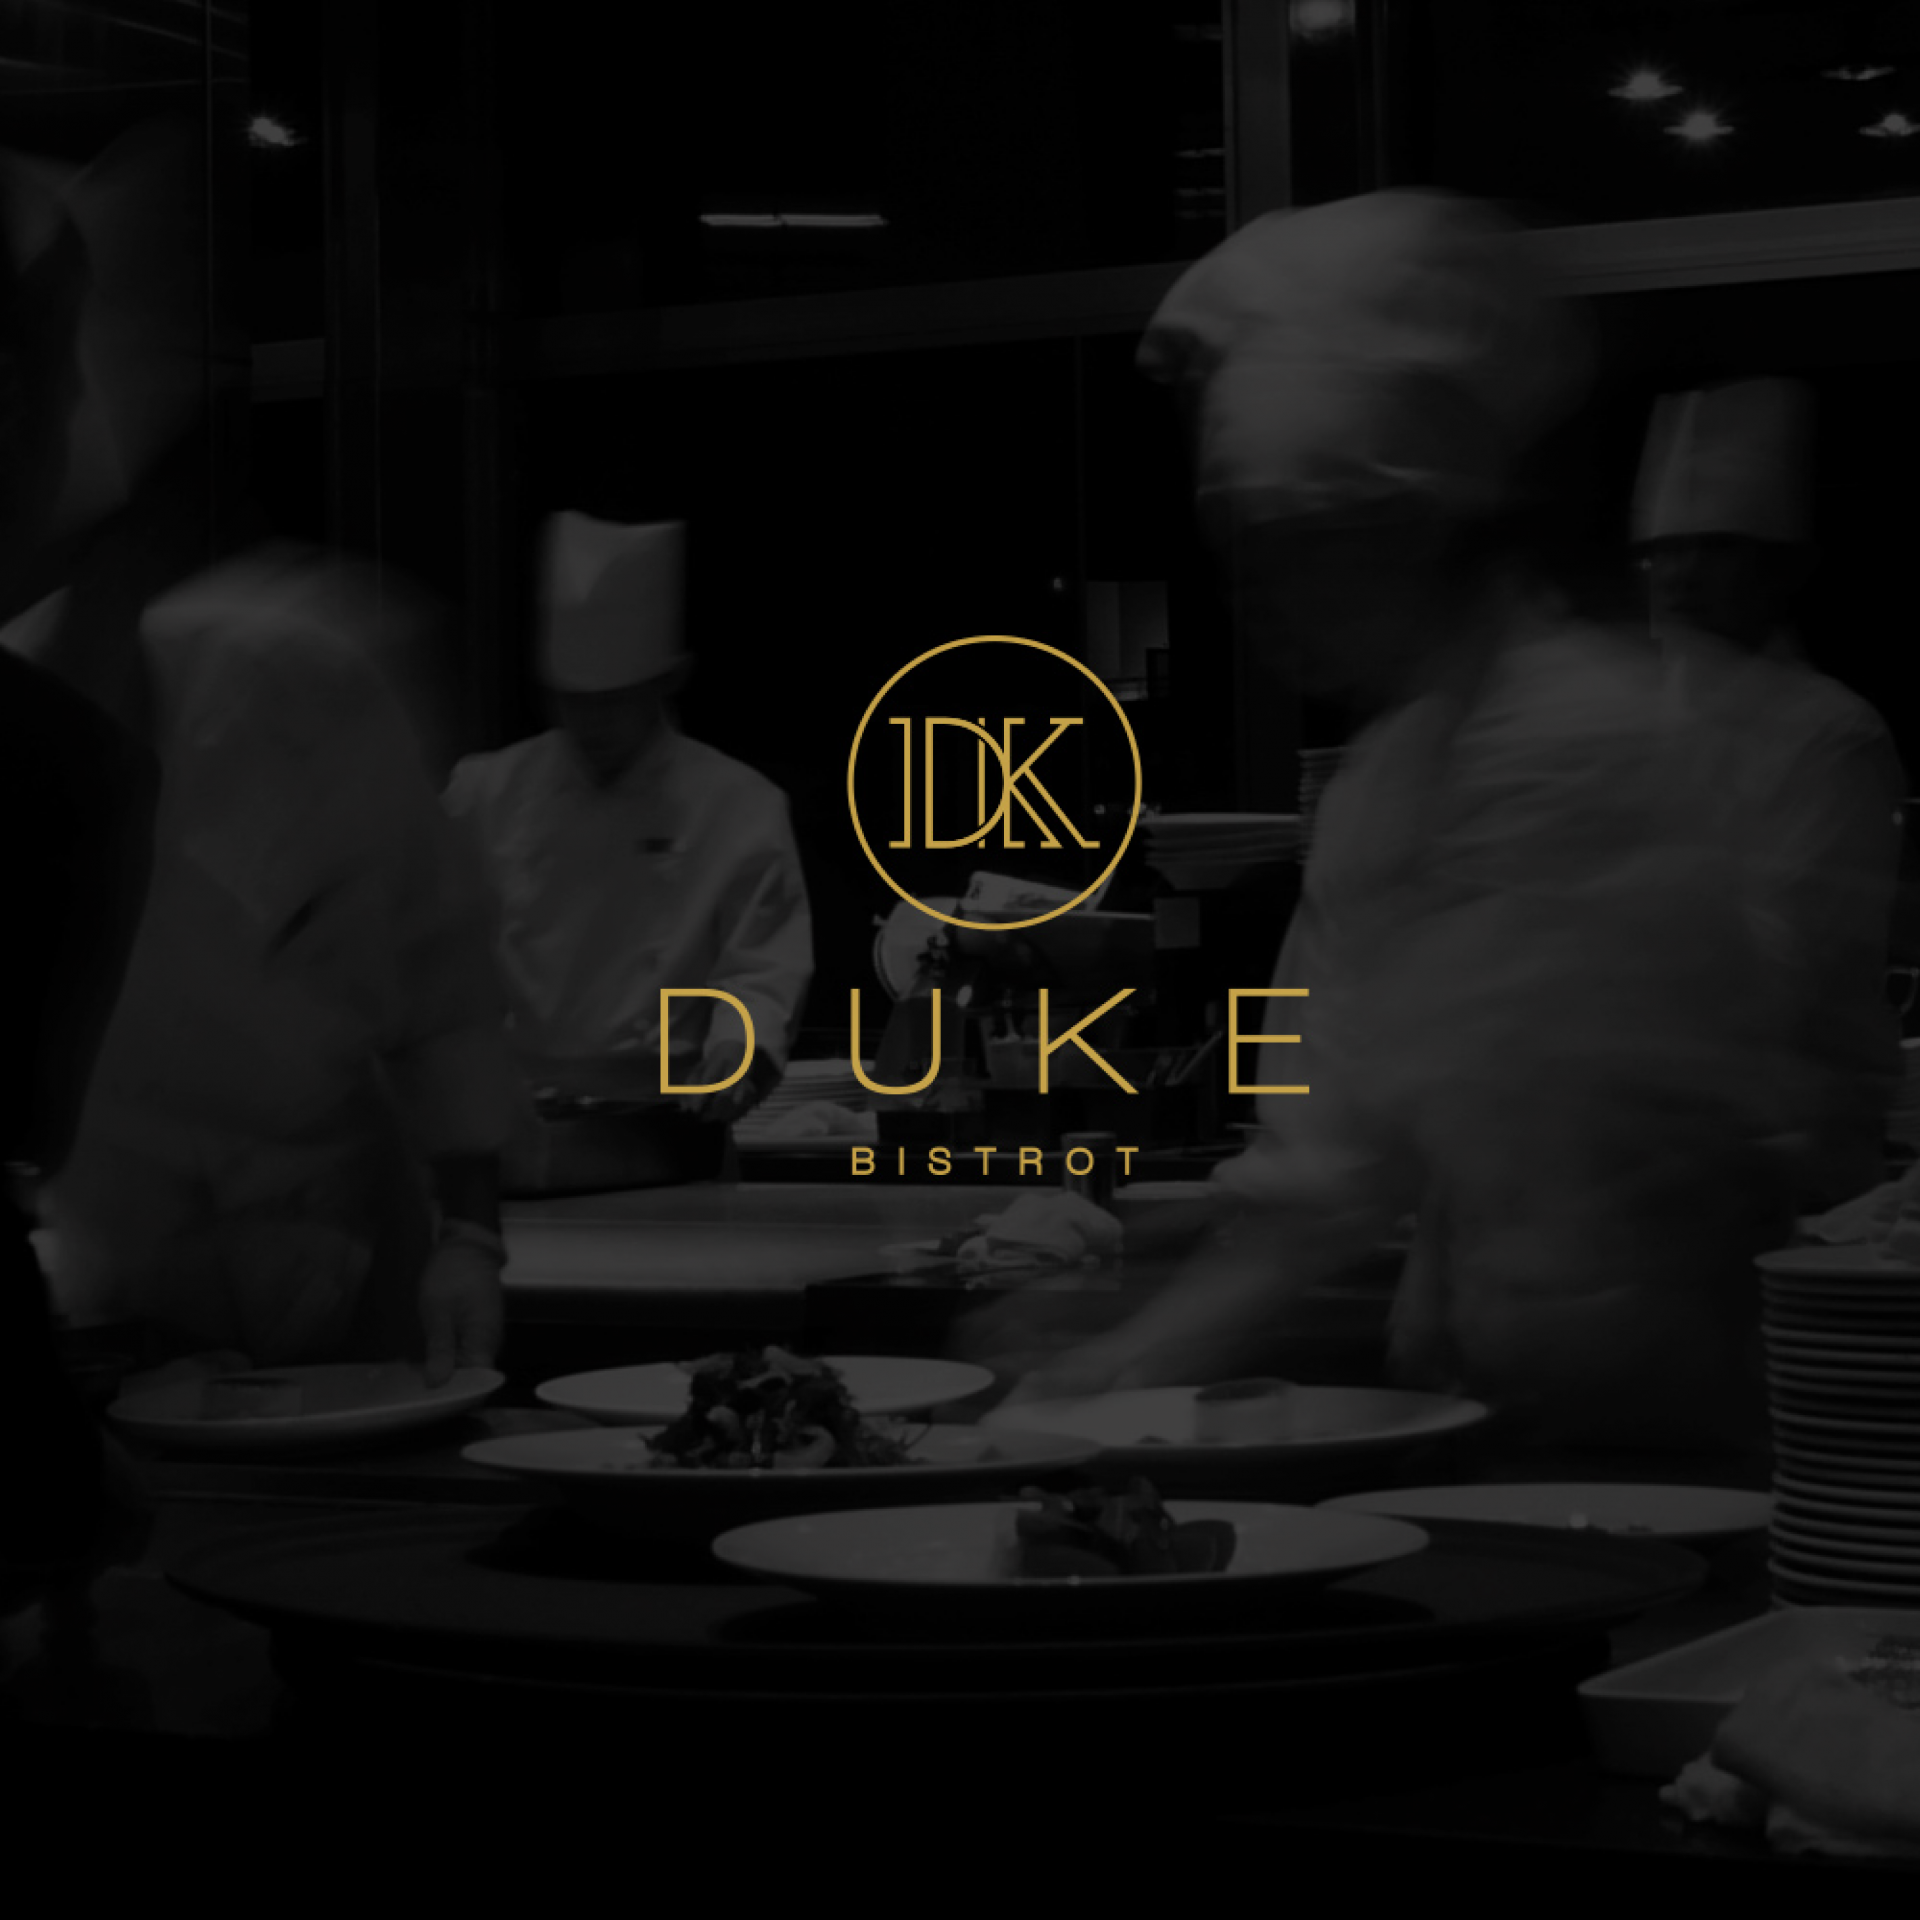 DUKE RESPONSIVO 01 - Duke